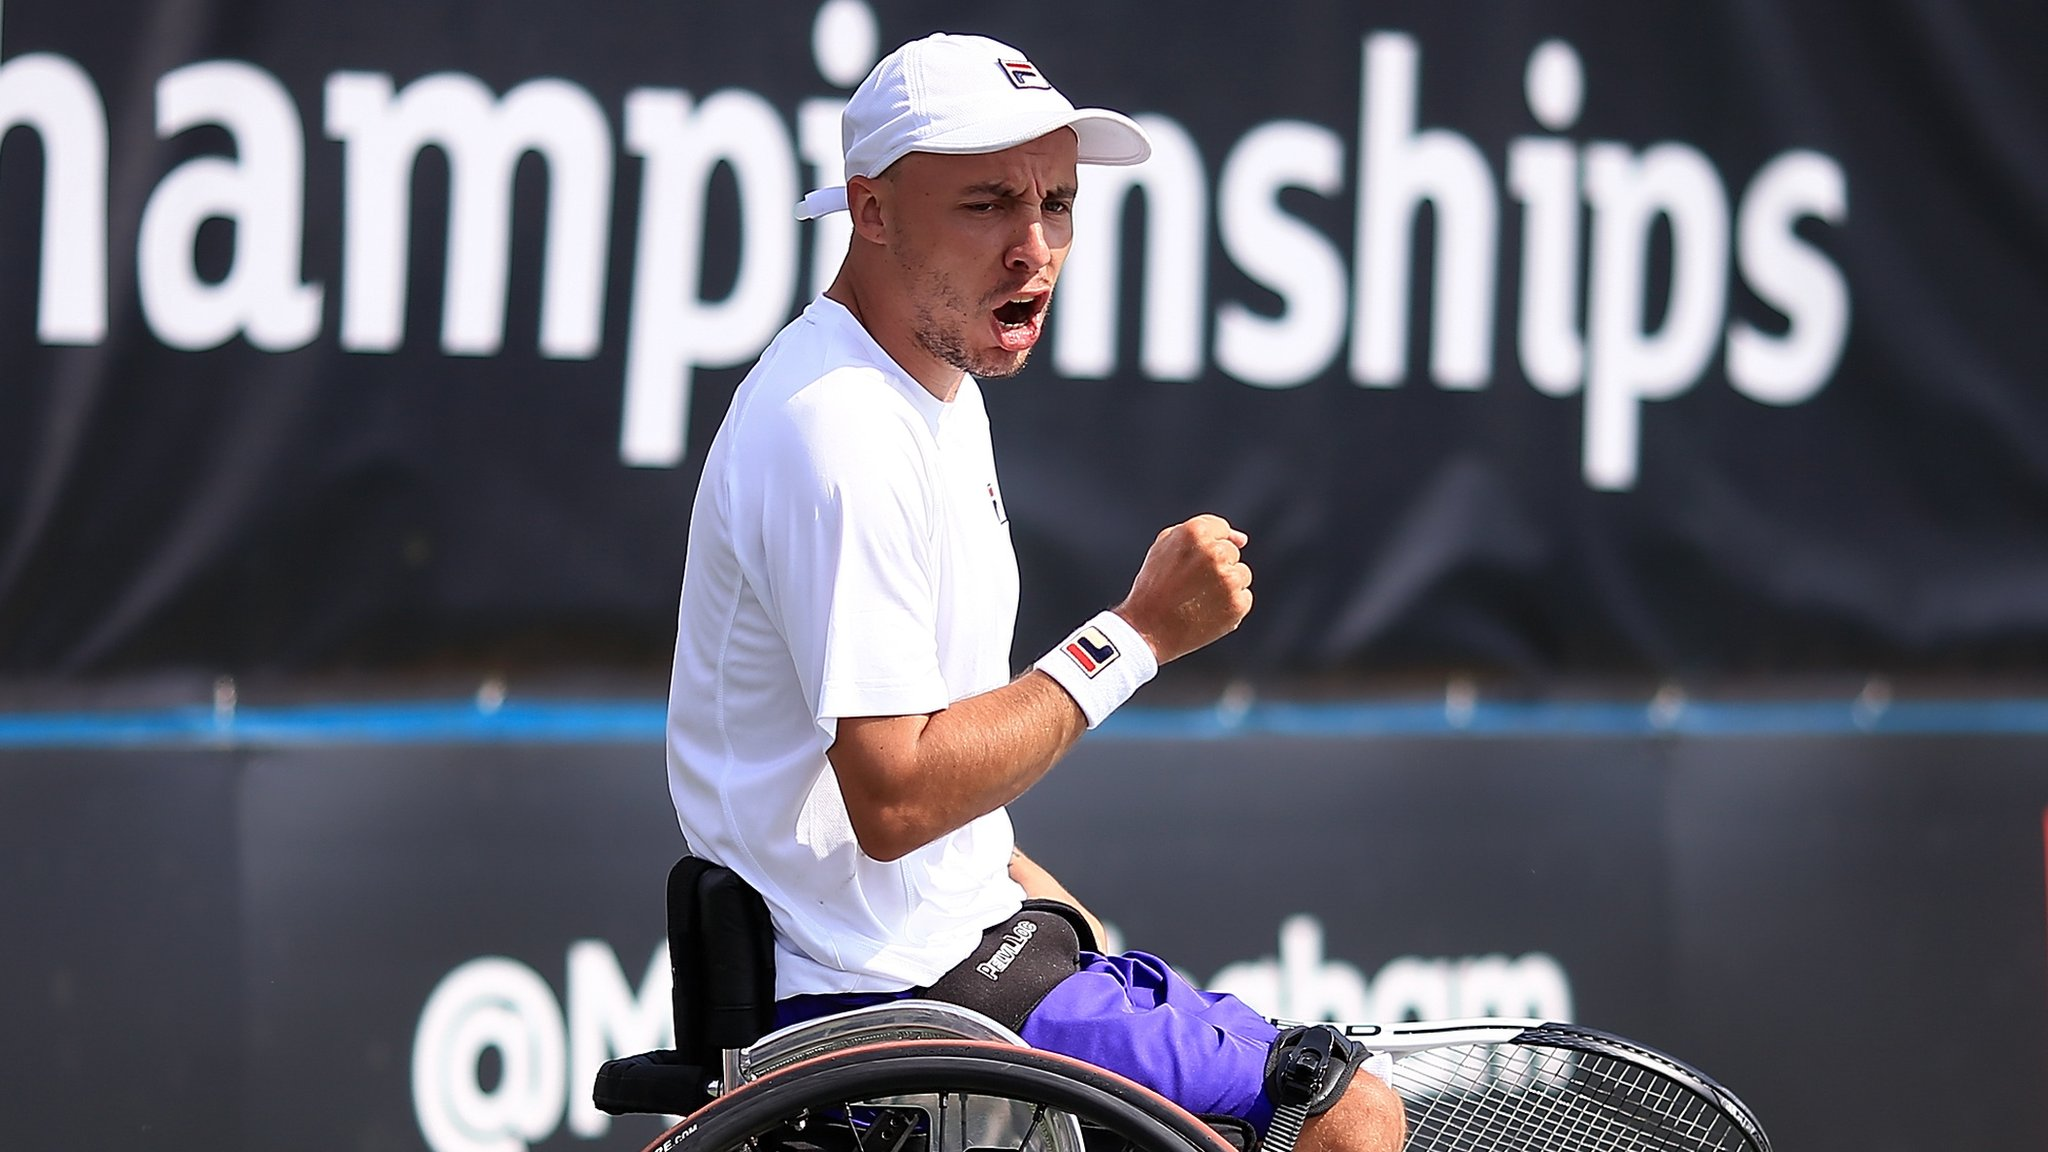 Lapthorne reaches British Open quad singles final